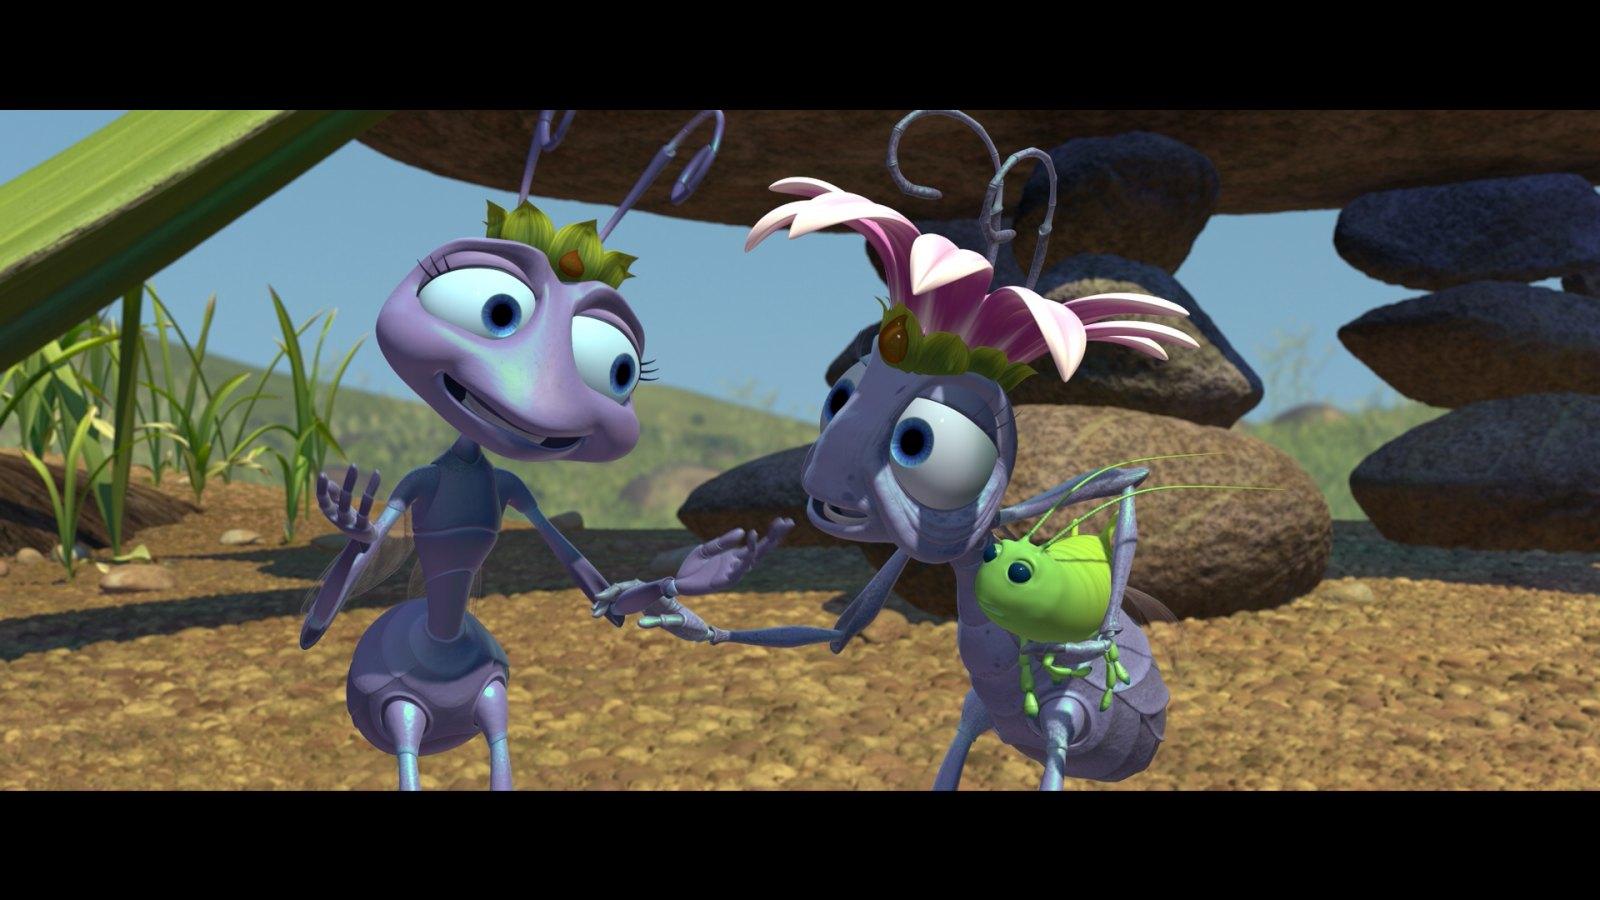 Vida de inseto-Princesa Atta e a Rainha